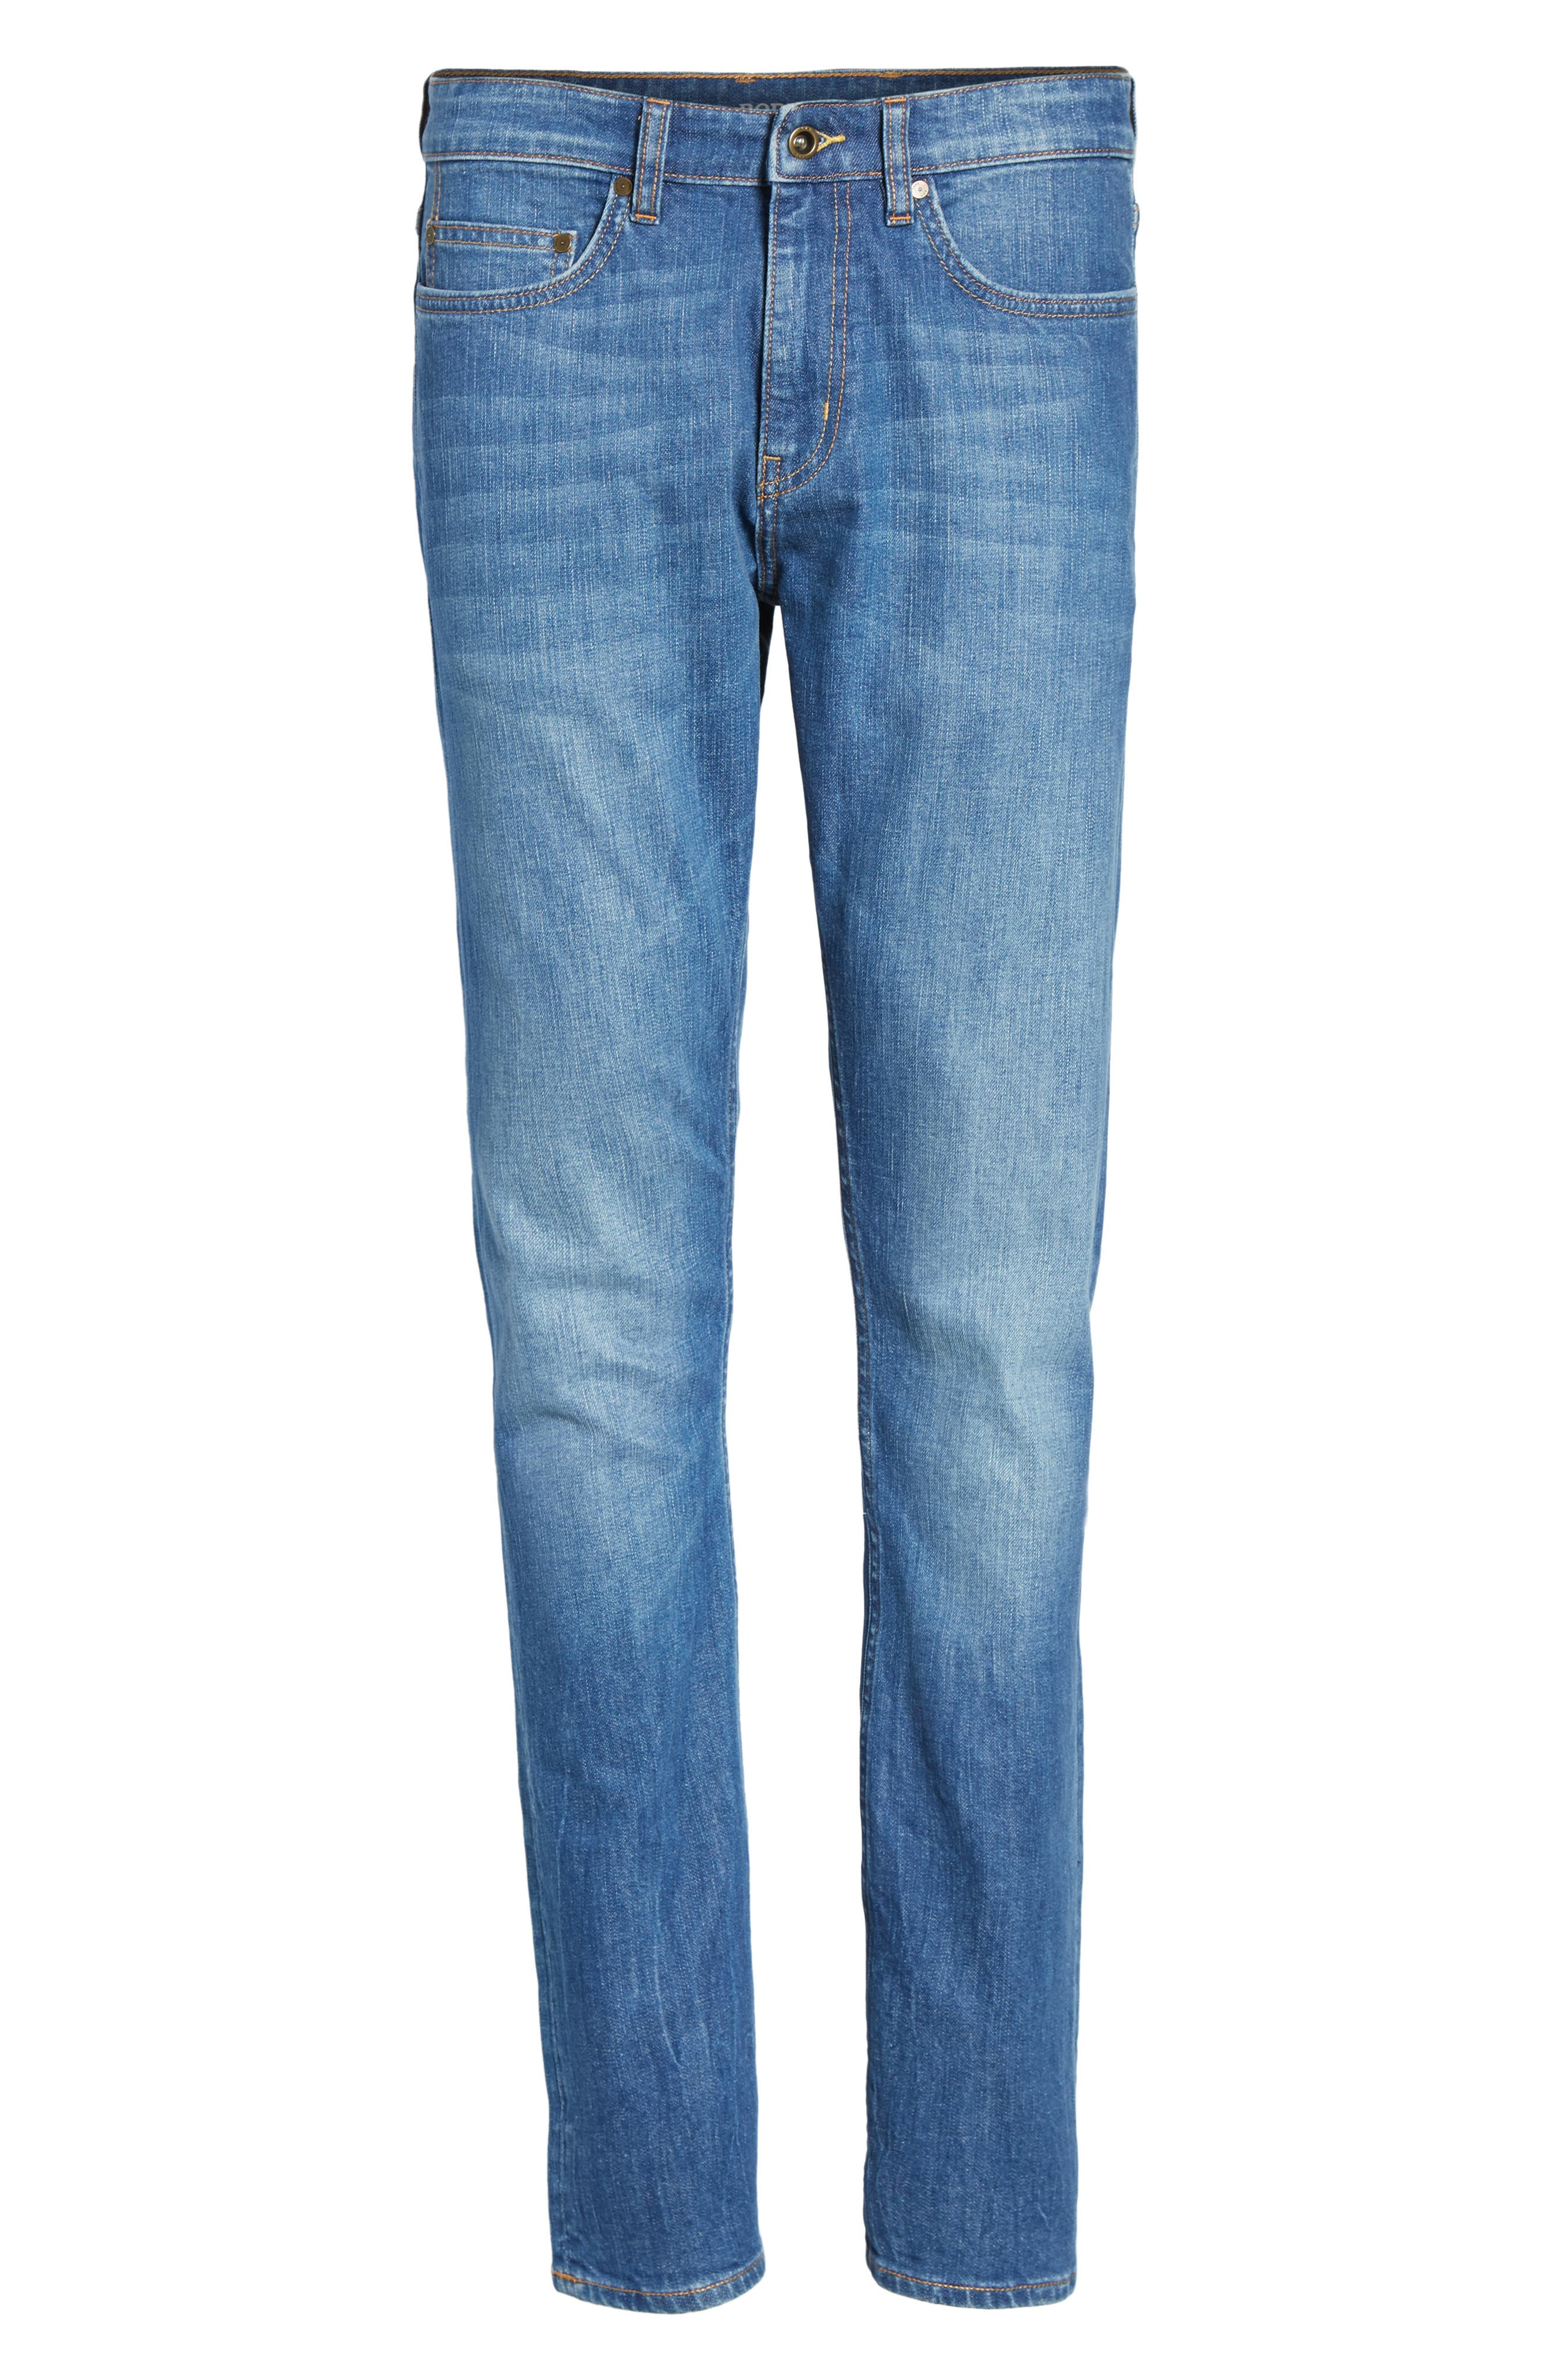 Cranfield Straight Leg Jeans,                             Alternate thumbnail 6, color,                             420